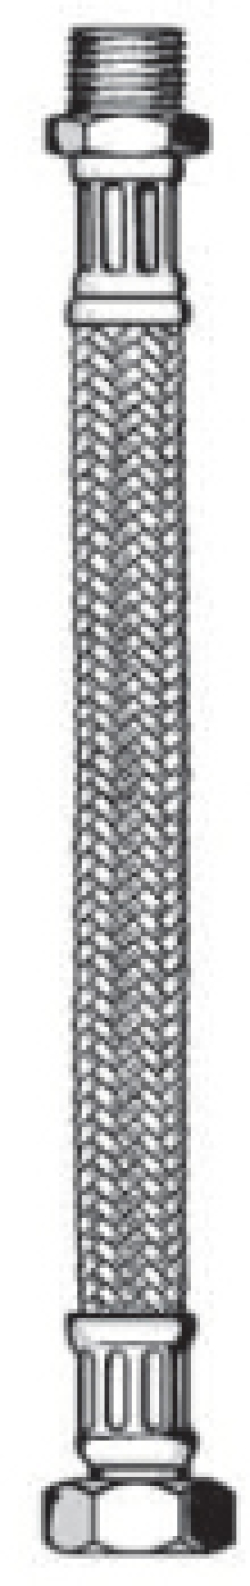 МЕ 5615.1204.40 Meiflex Dn13, 1/2 BPx1/2 BP, 400mm